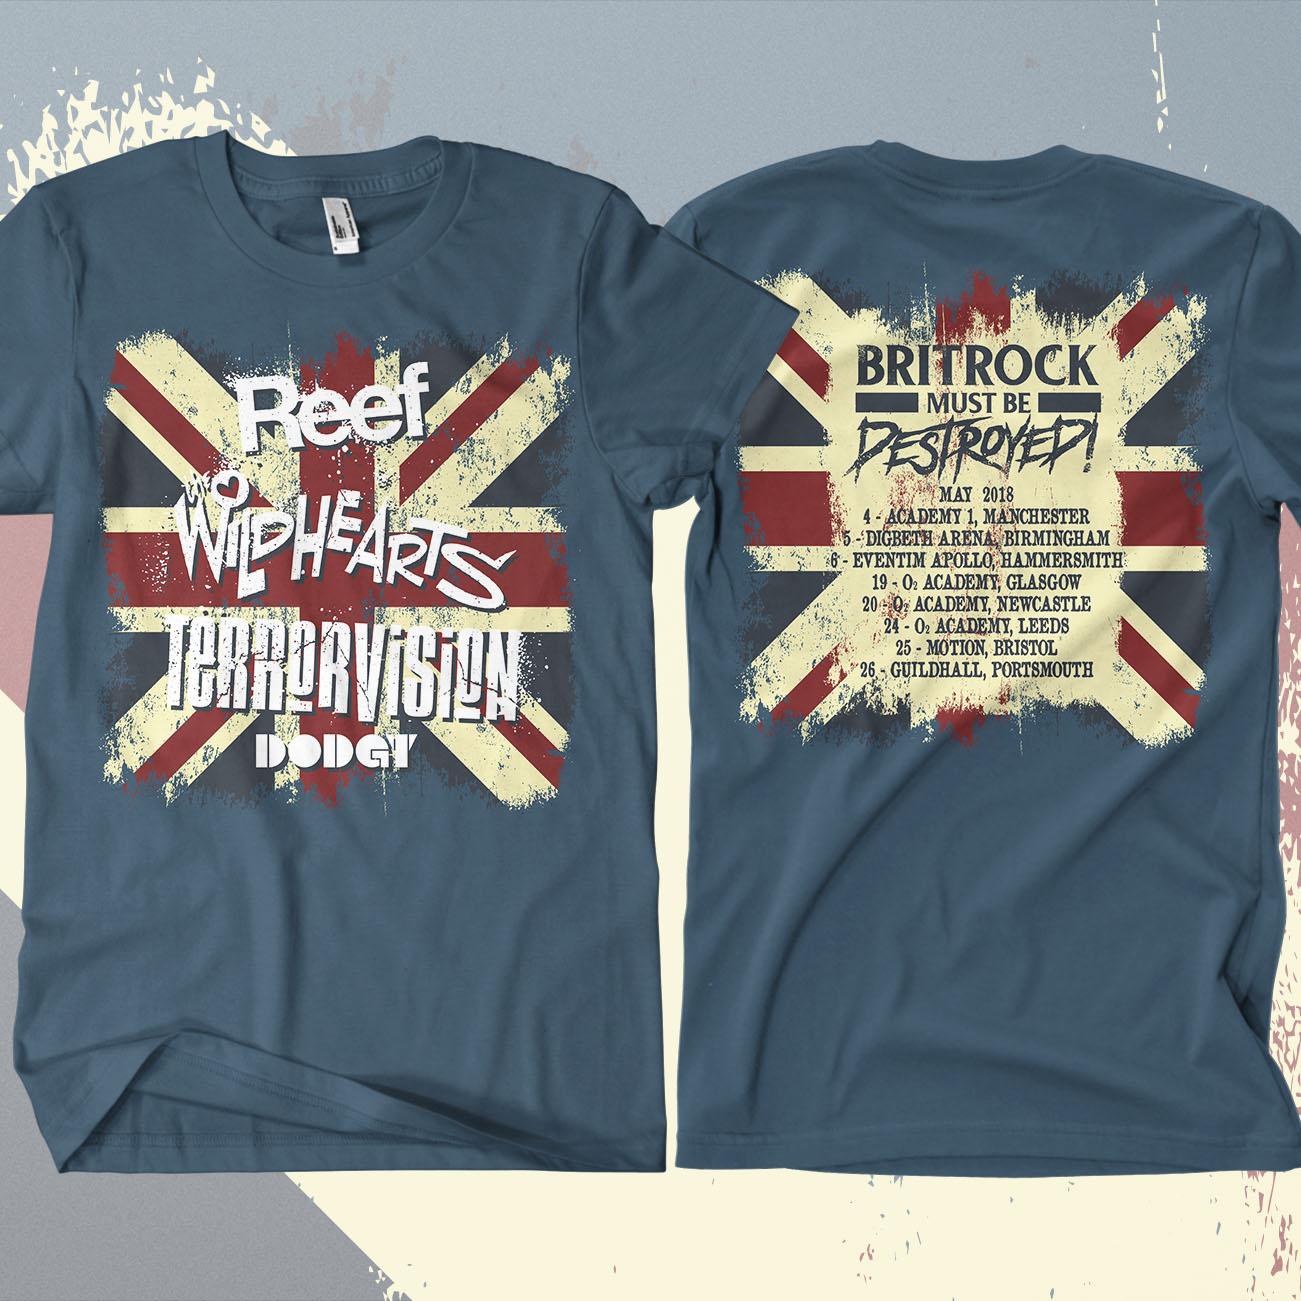 Reef - 'Britrock Must Be Destroyed' Blue UK Tour T-Shirt - Omerch